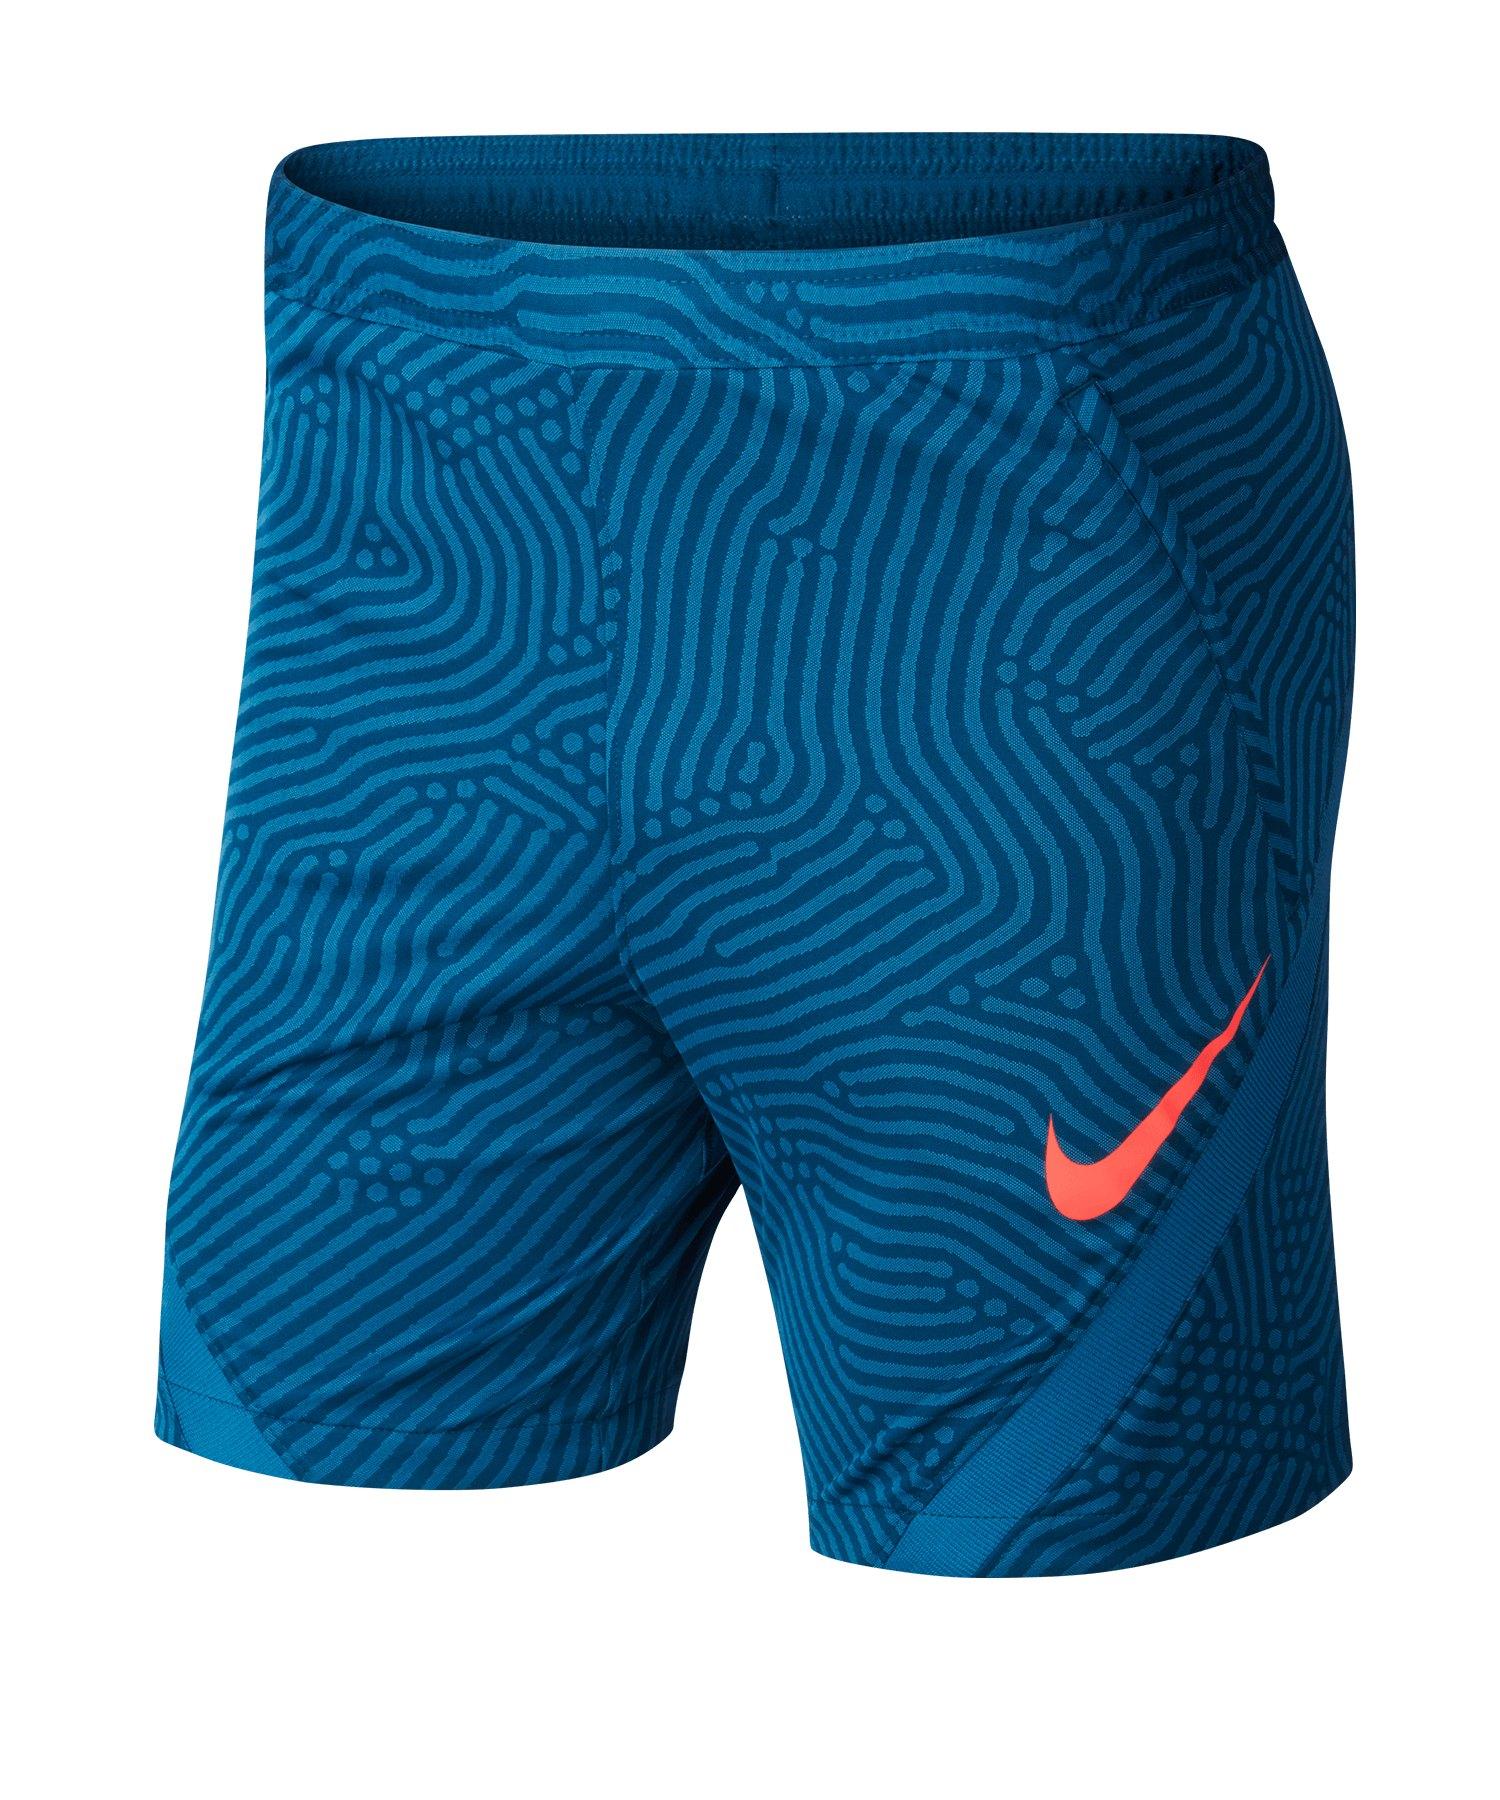 Nike Strike Short Blau F432 - blau